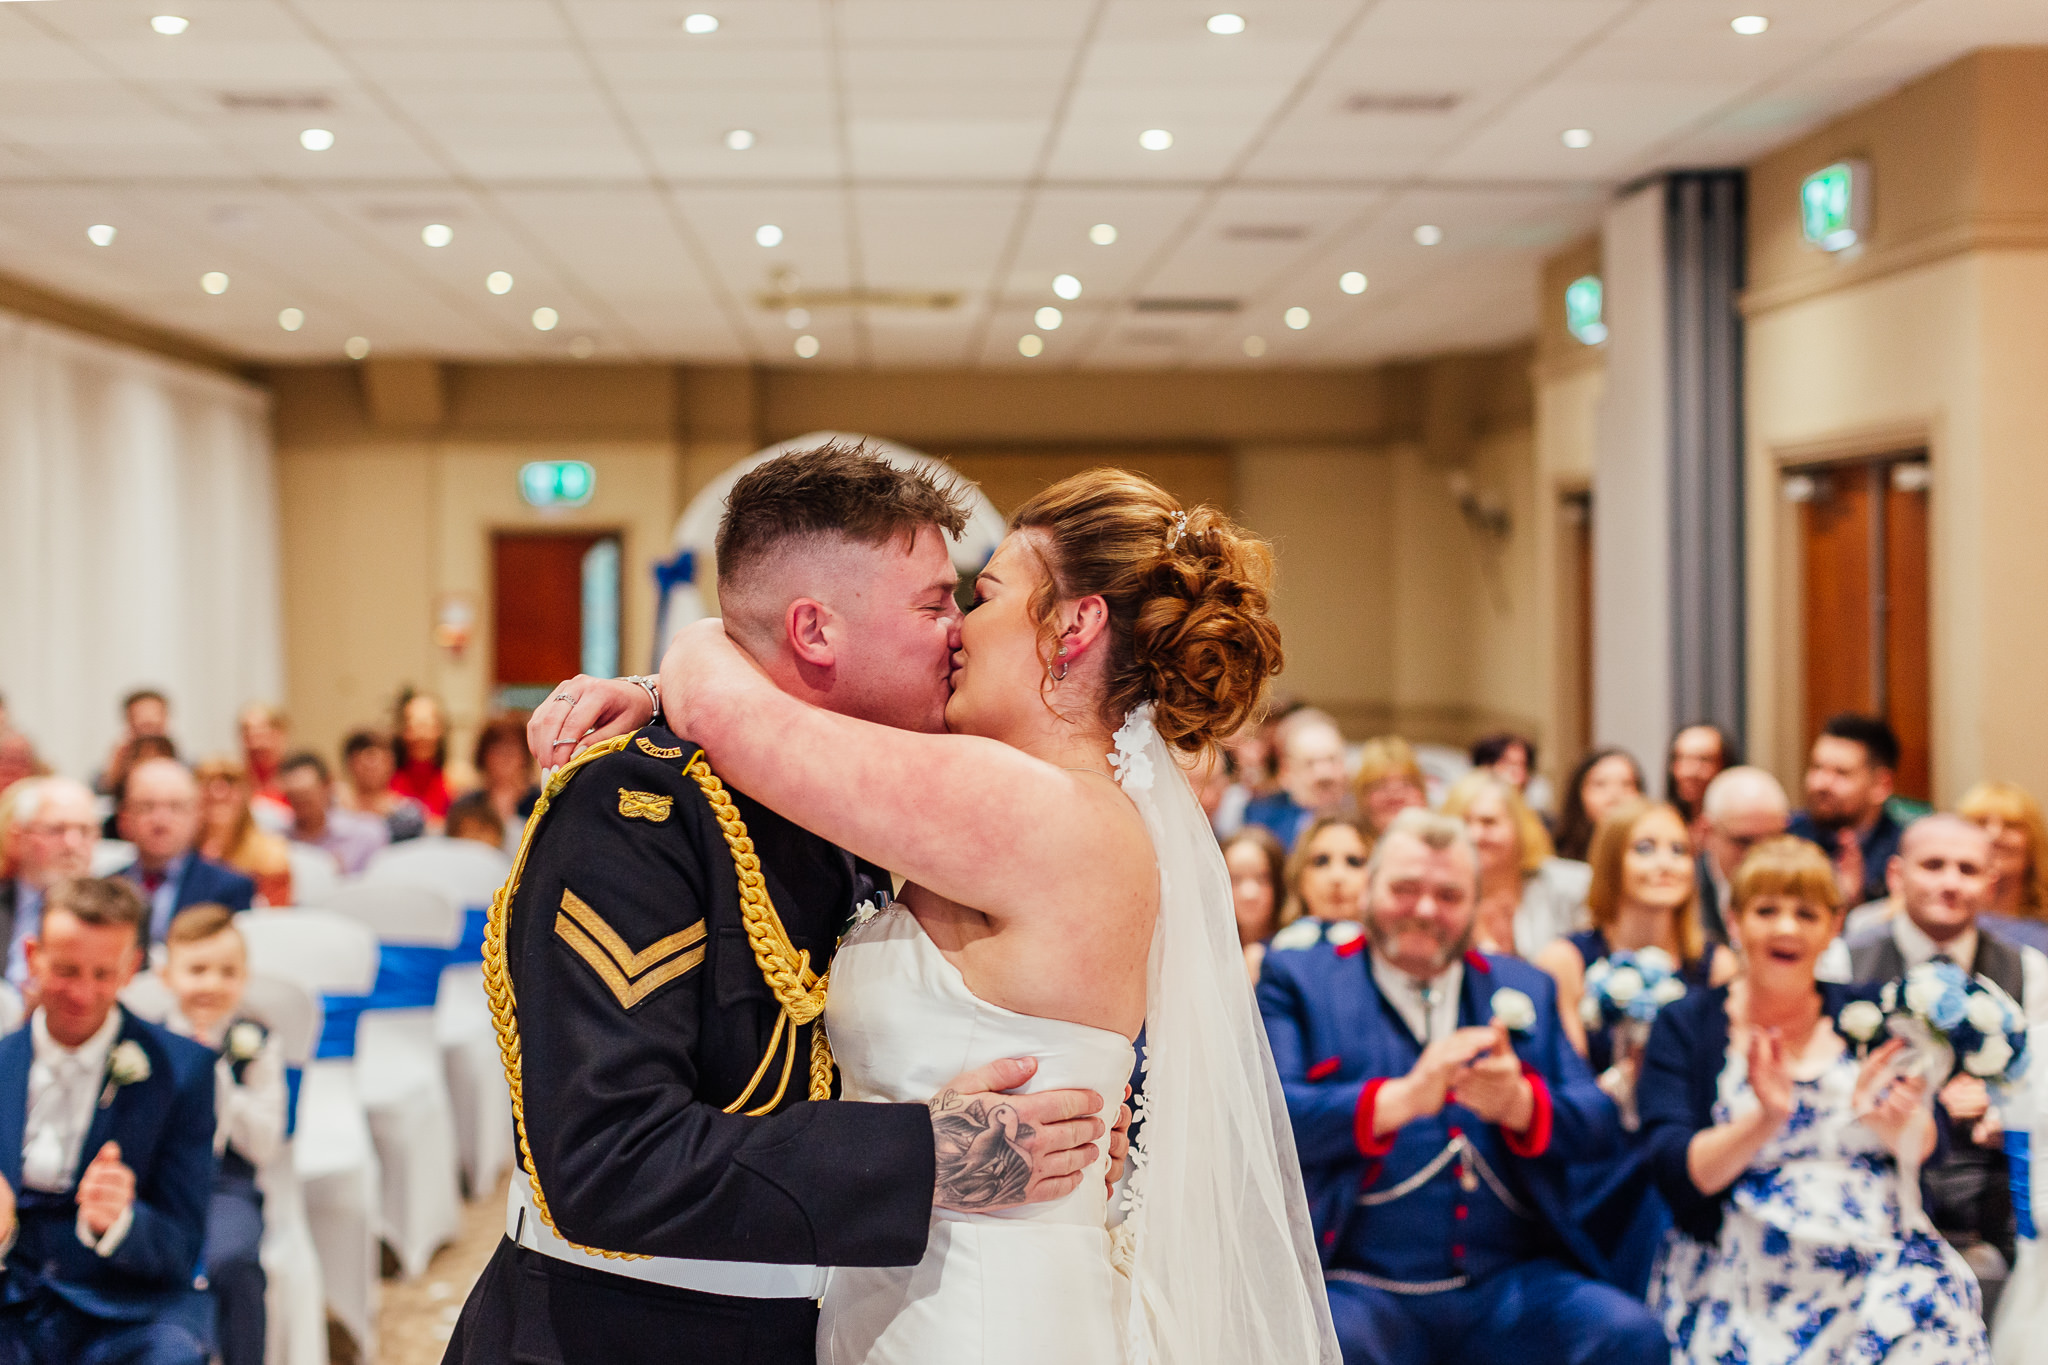 Mollingtonbanastre_wedding-11.jpg